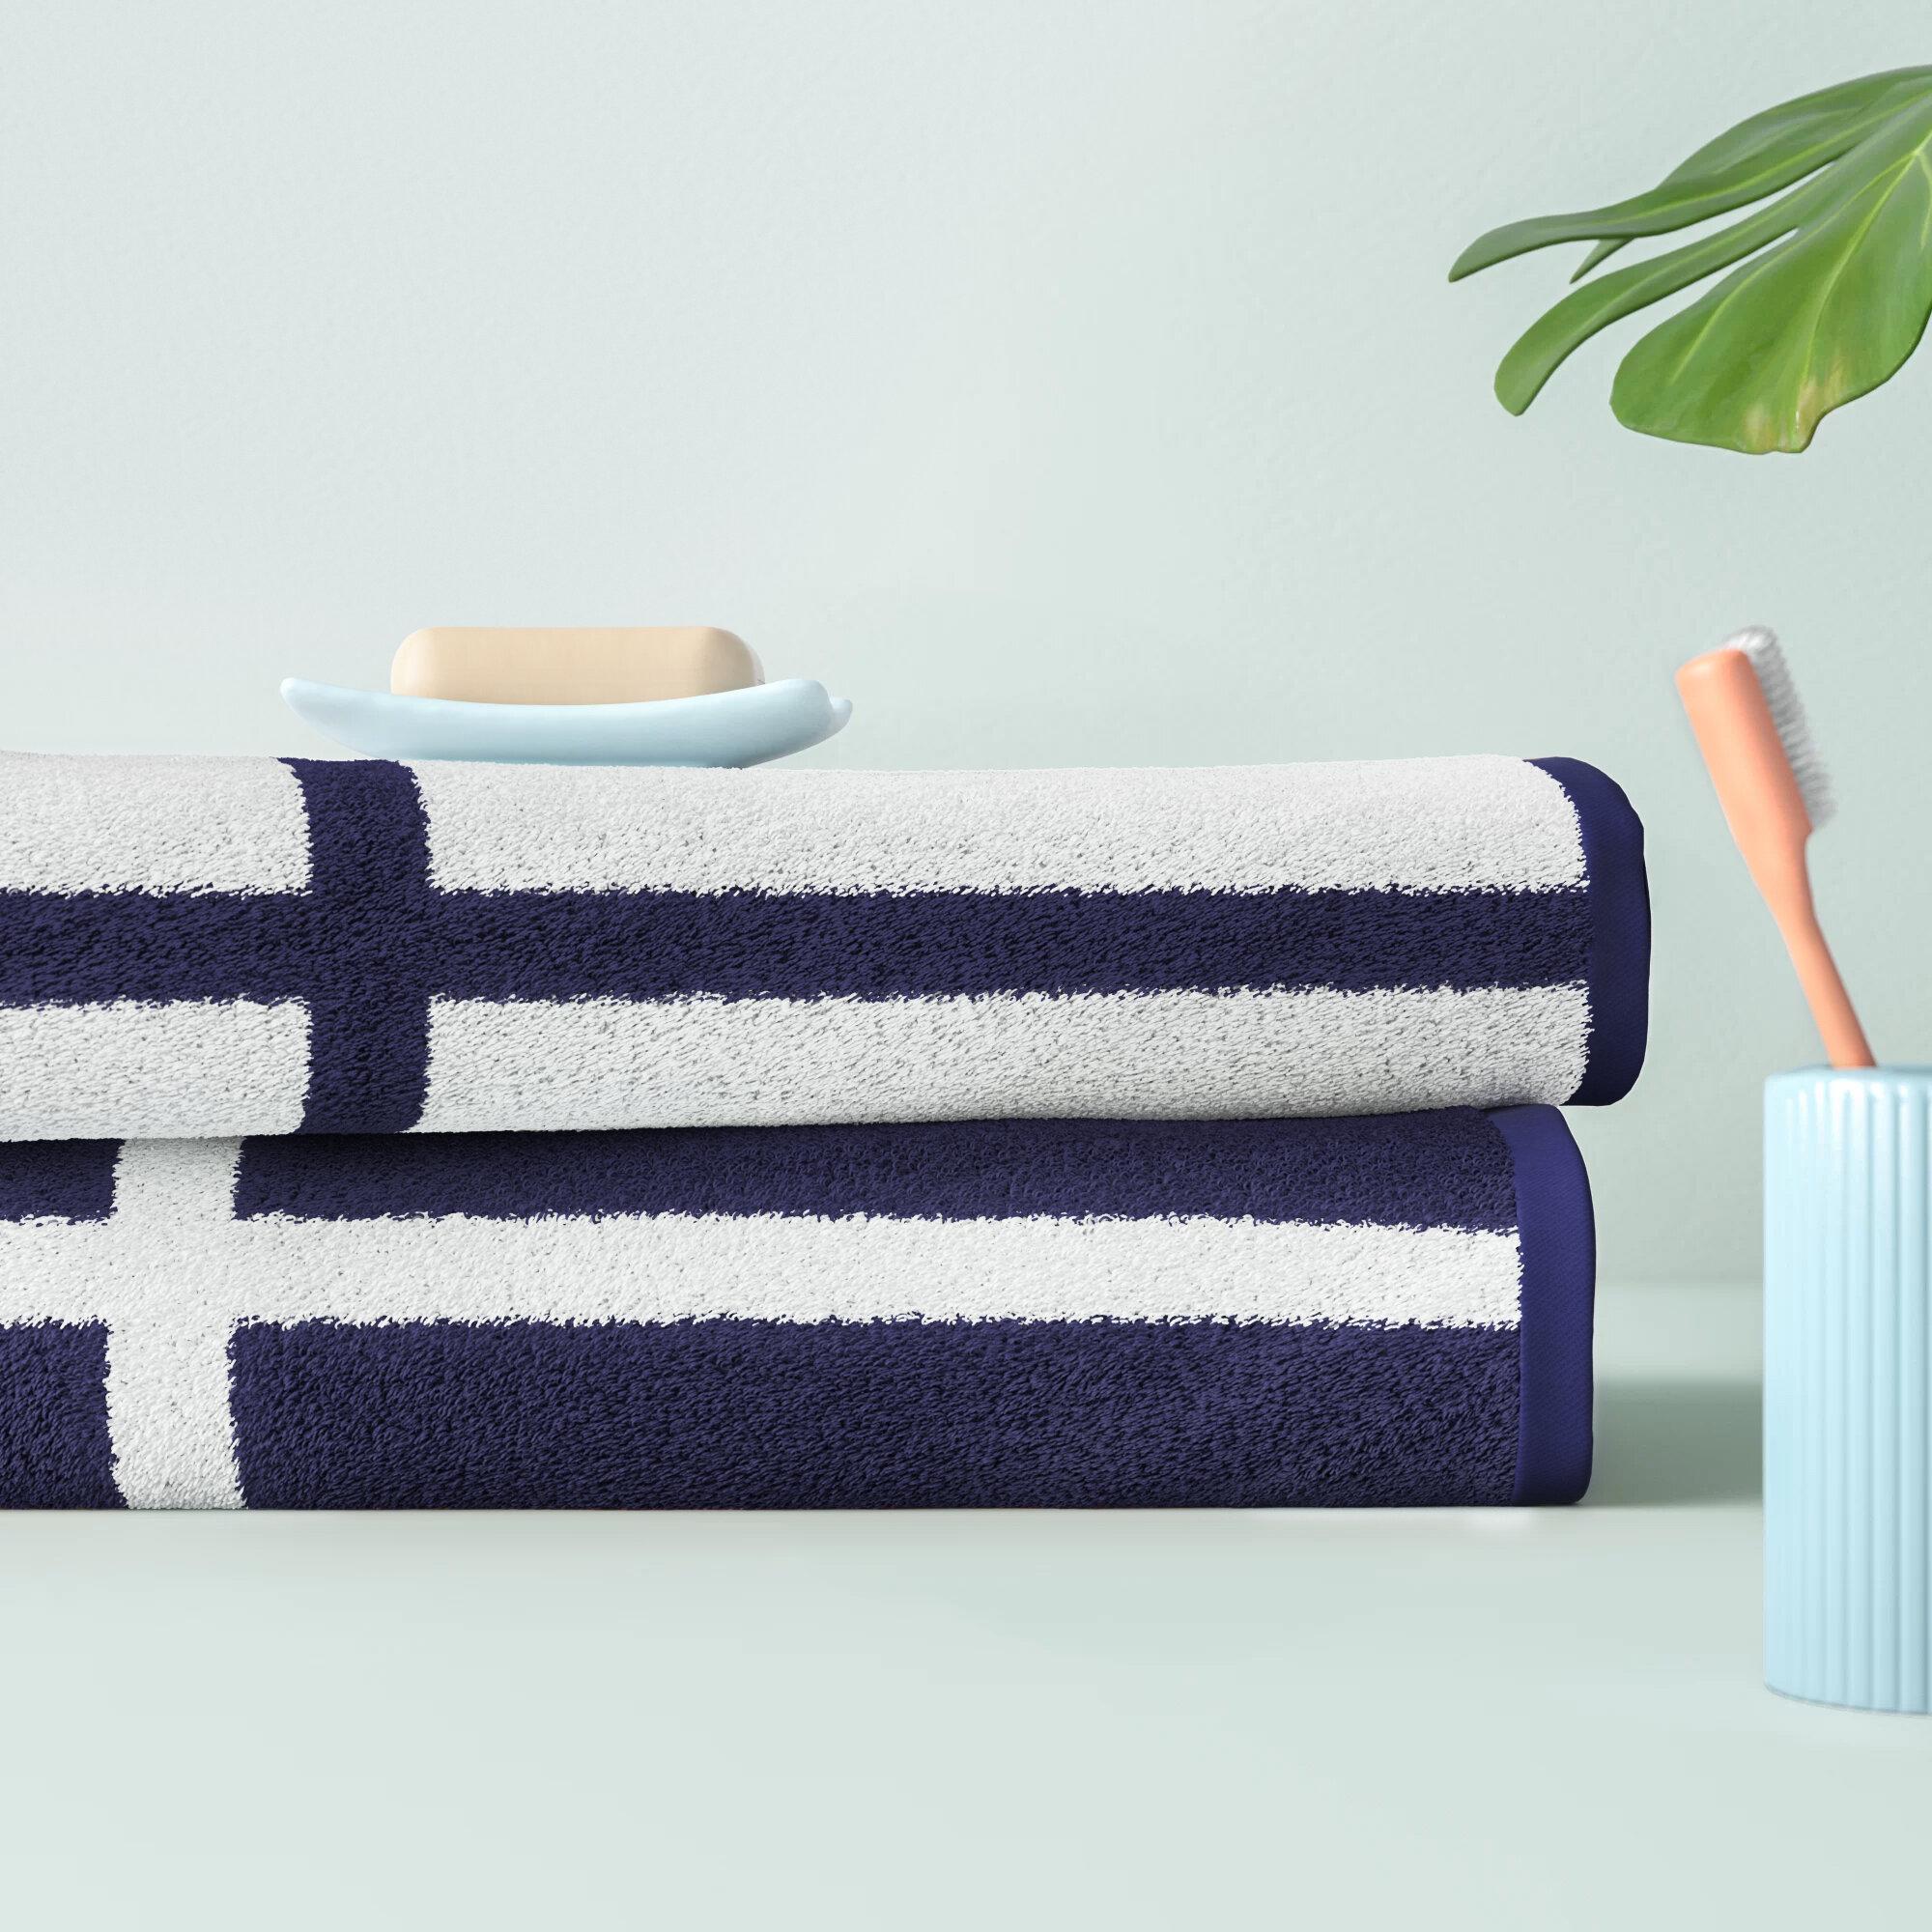 Hashtag Home Phenomenon Reversible 2 Piece 100 Cotton Bath Sheet Towel Set Reviews Wayfair